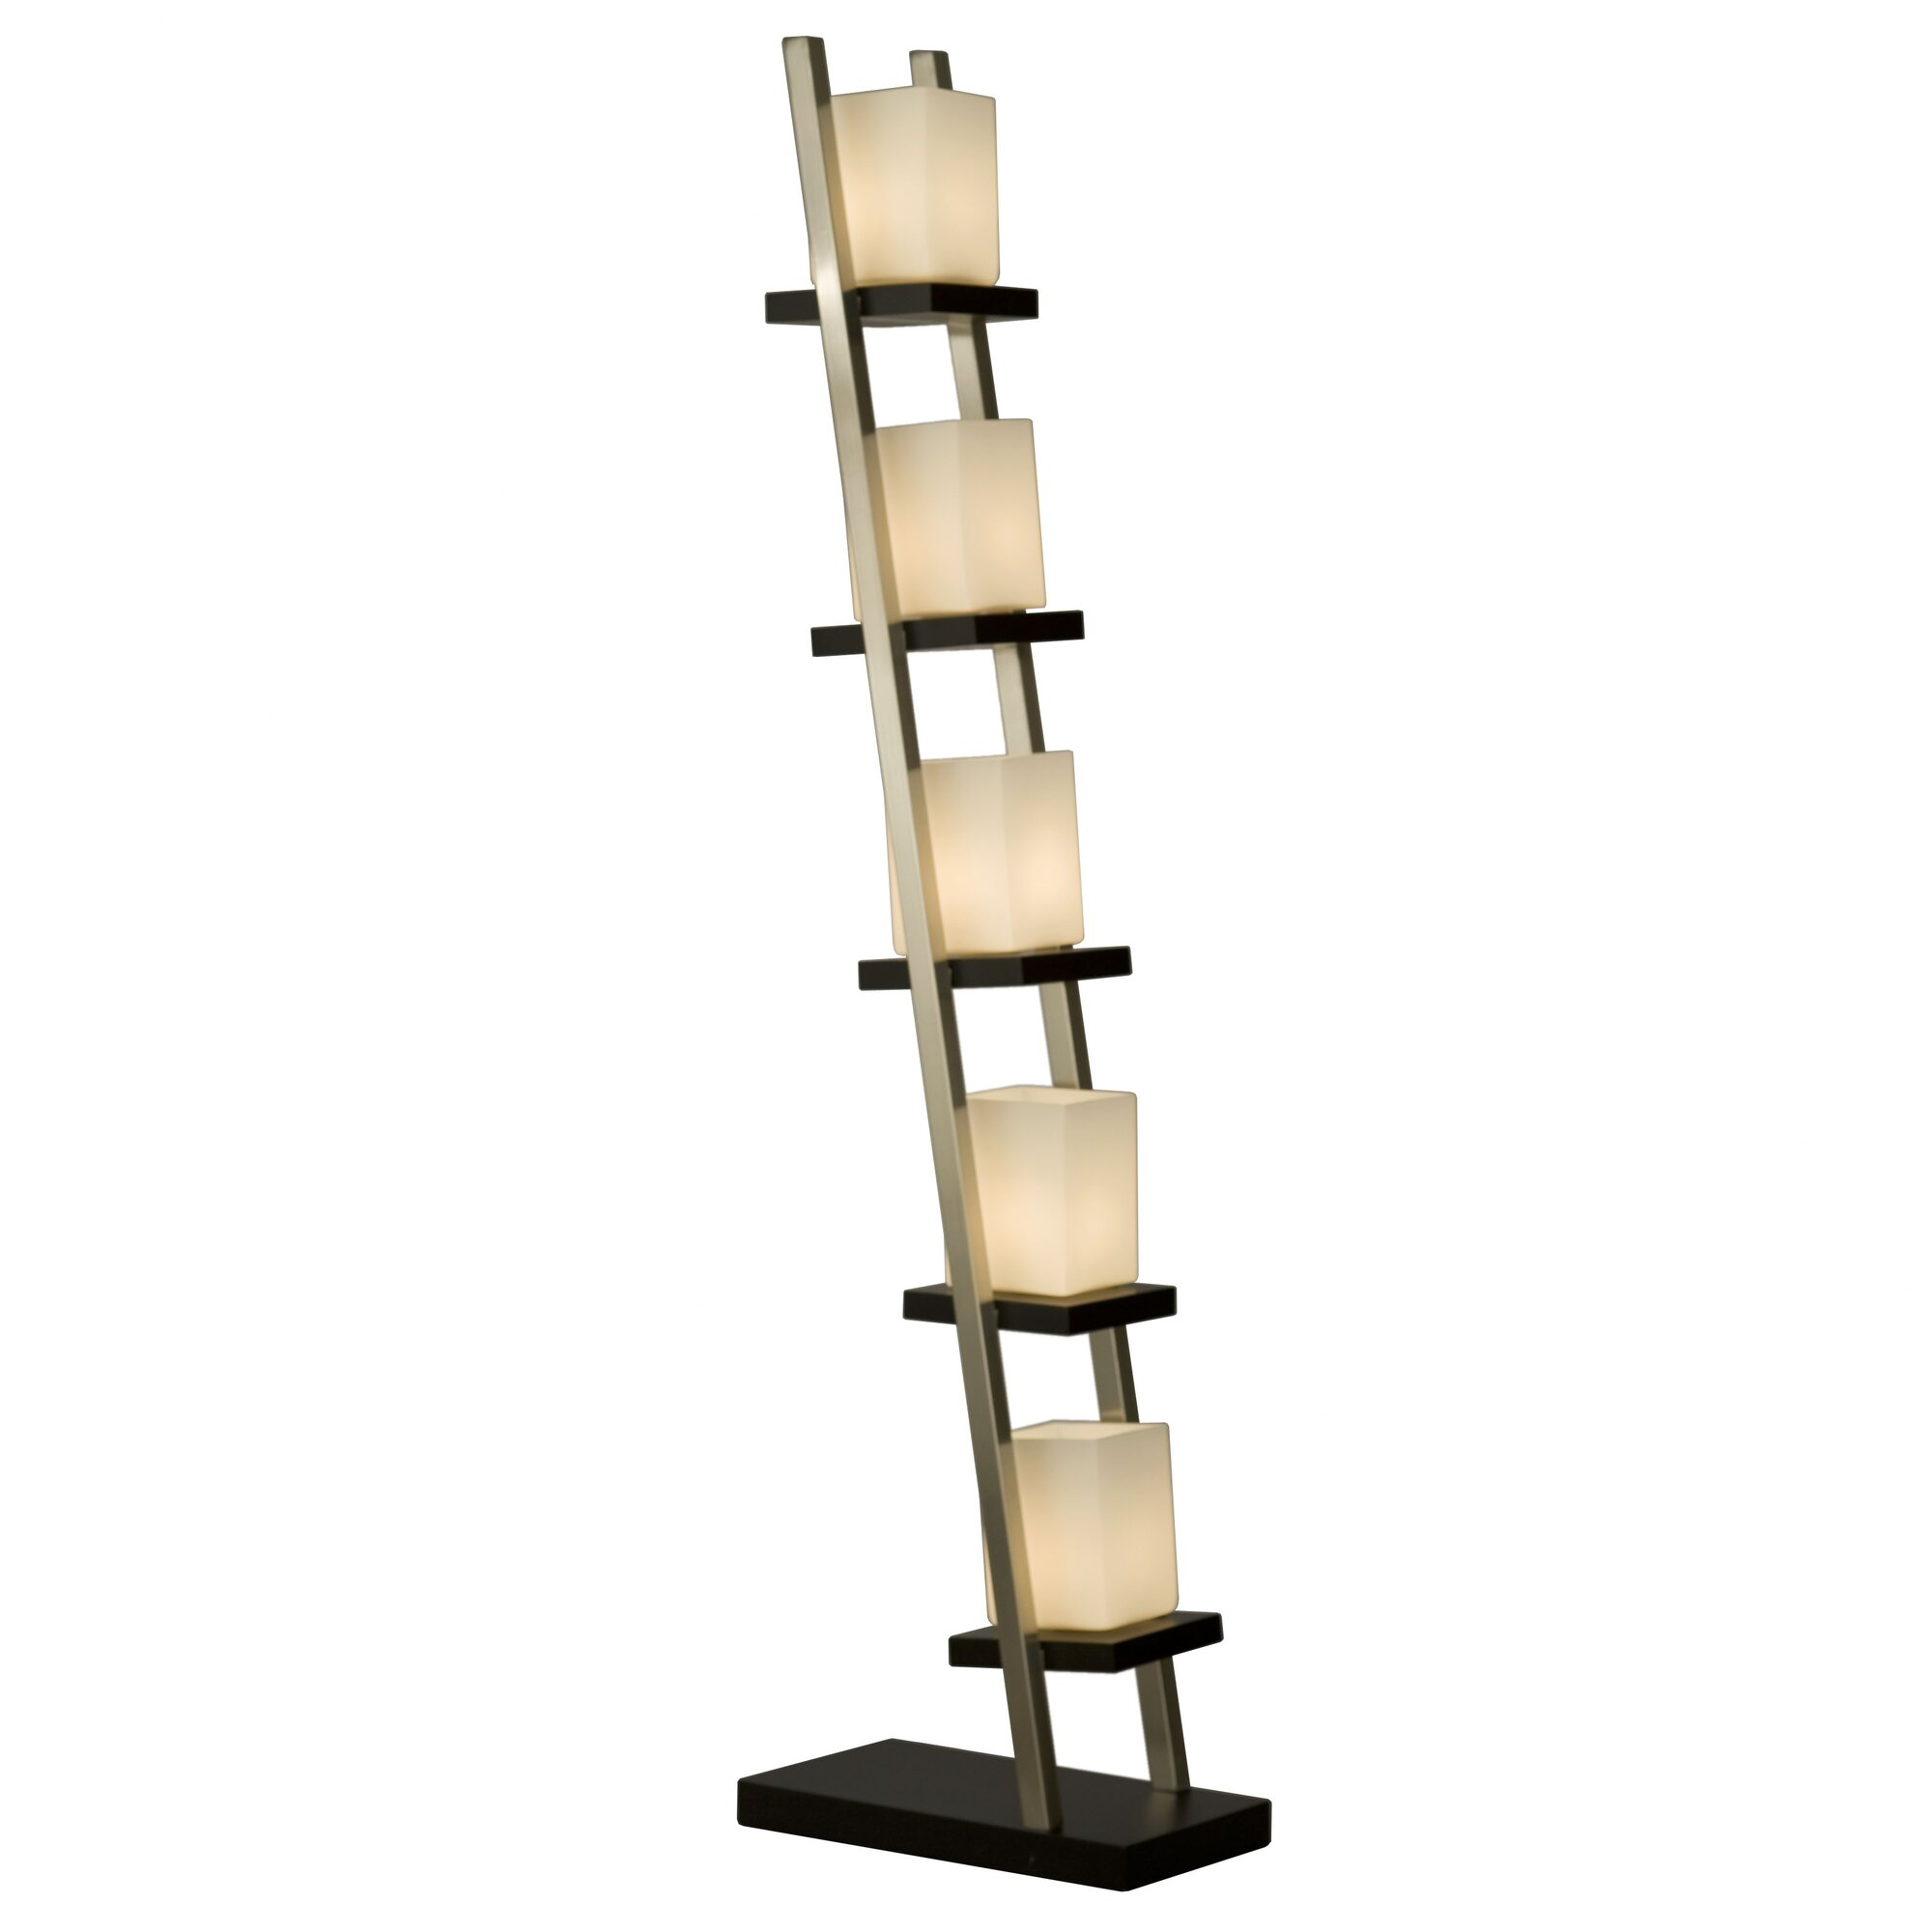 Nova of california escalier 61 column floor lamp for Floor pillars